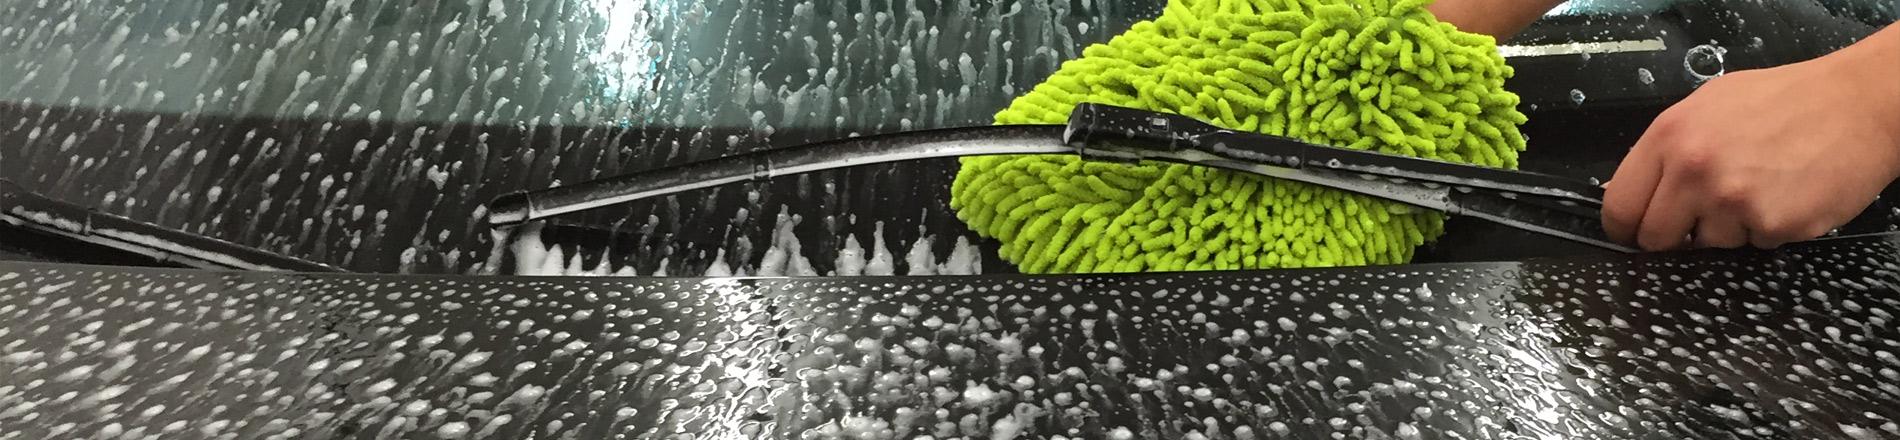 Glanz Fahrzeugaufbereitung Bergkamen | Handwäche